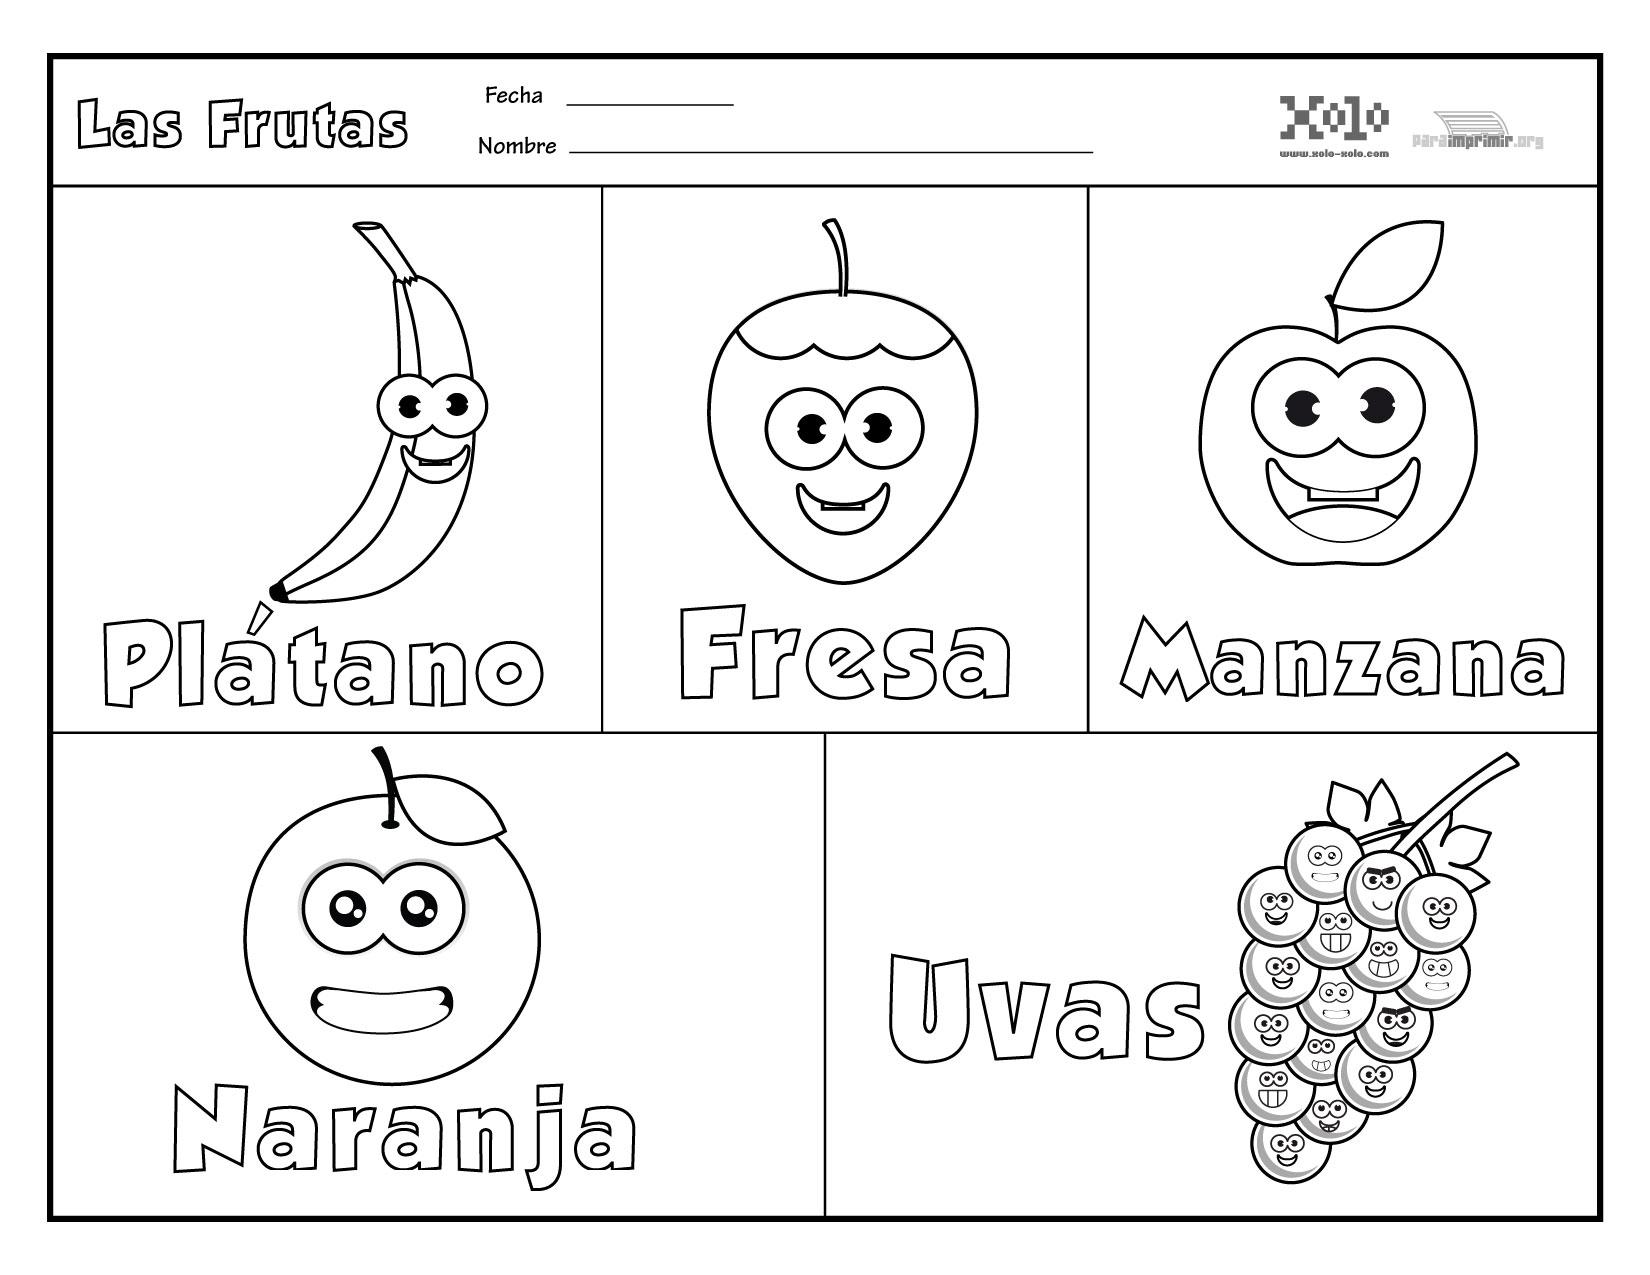 coloring pages las frutas spanish - photo#6